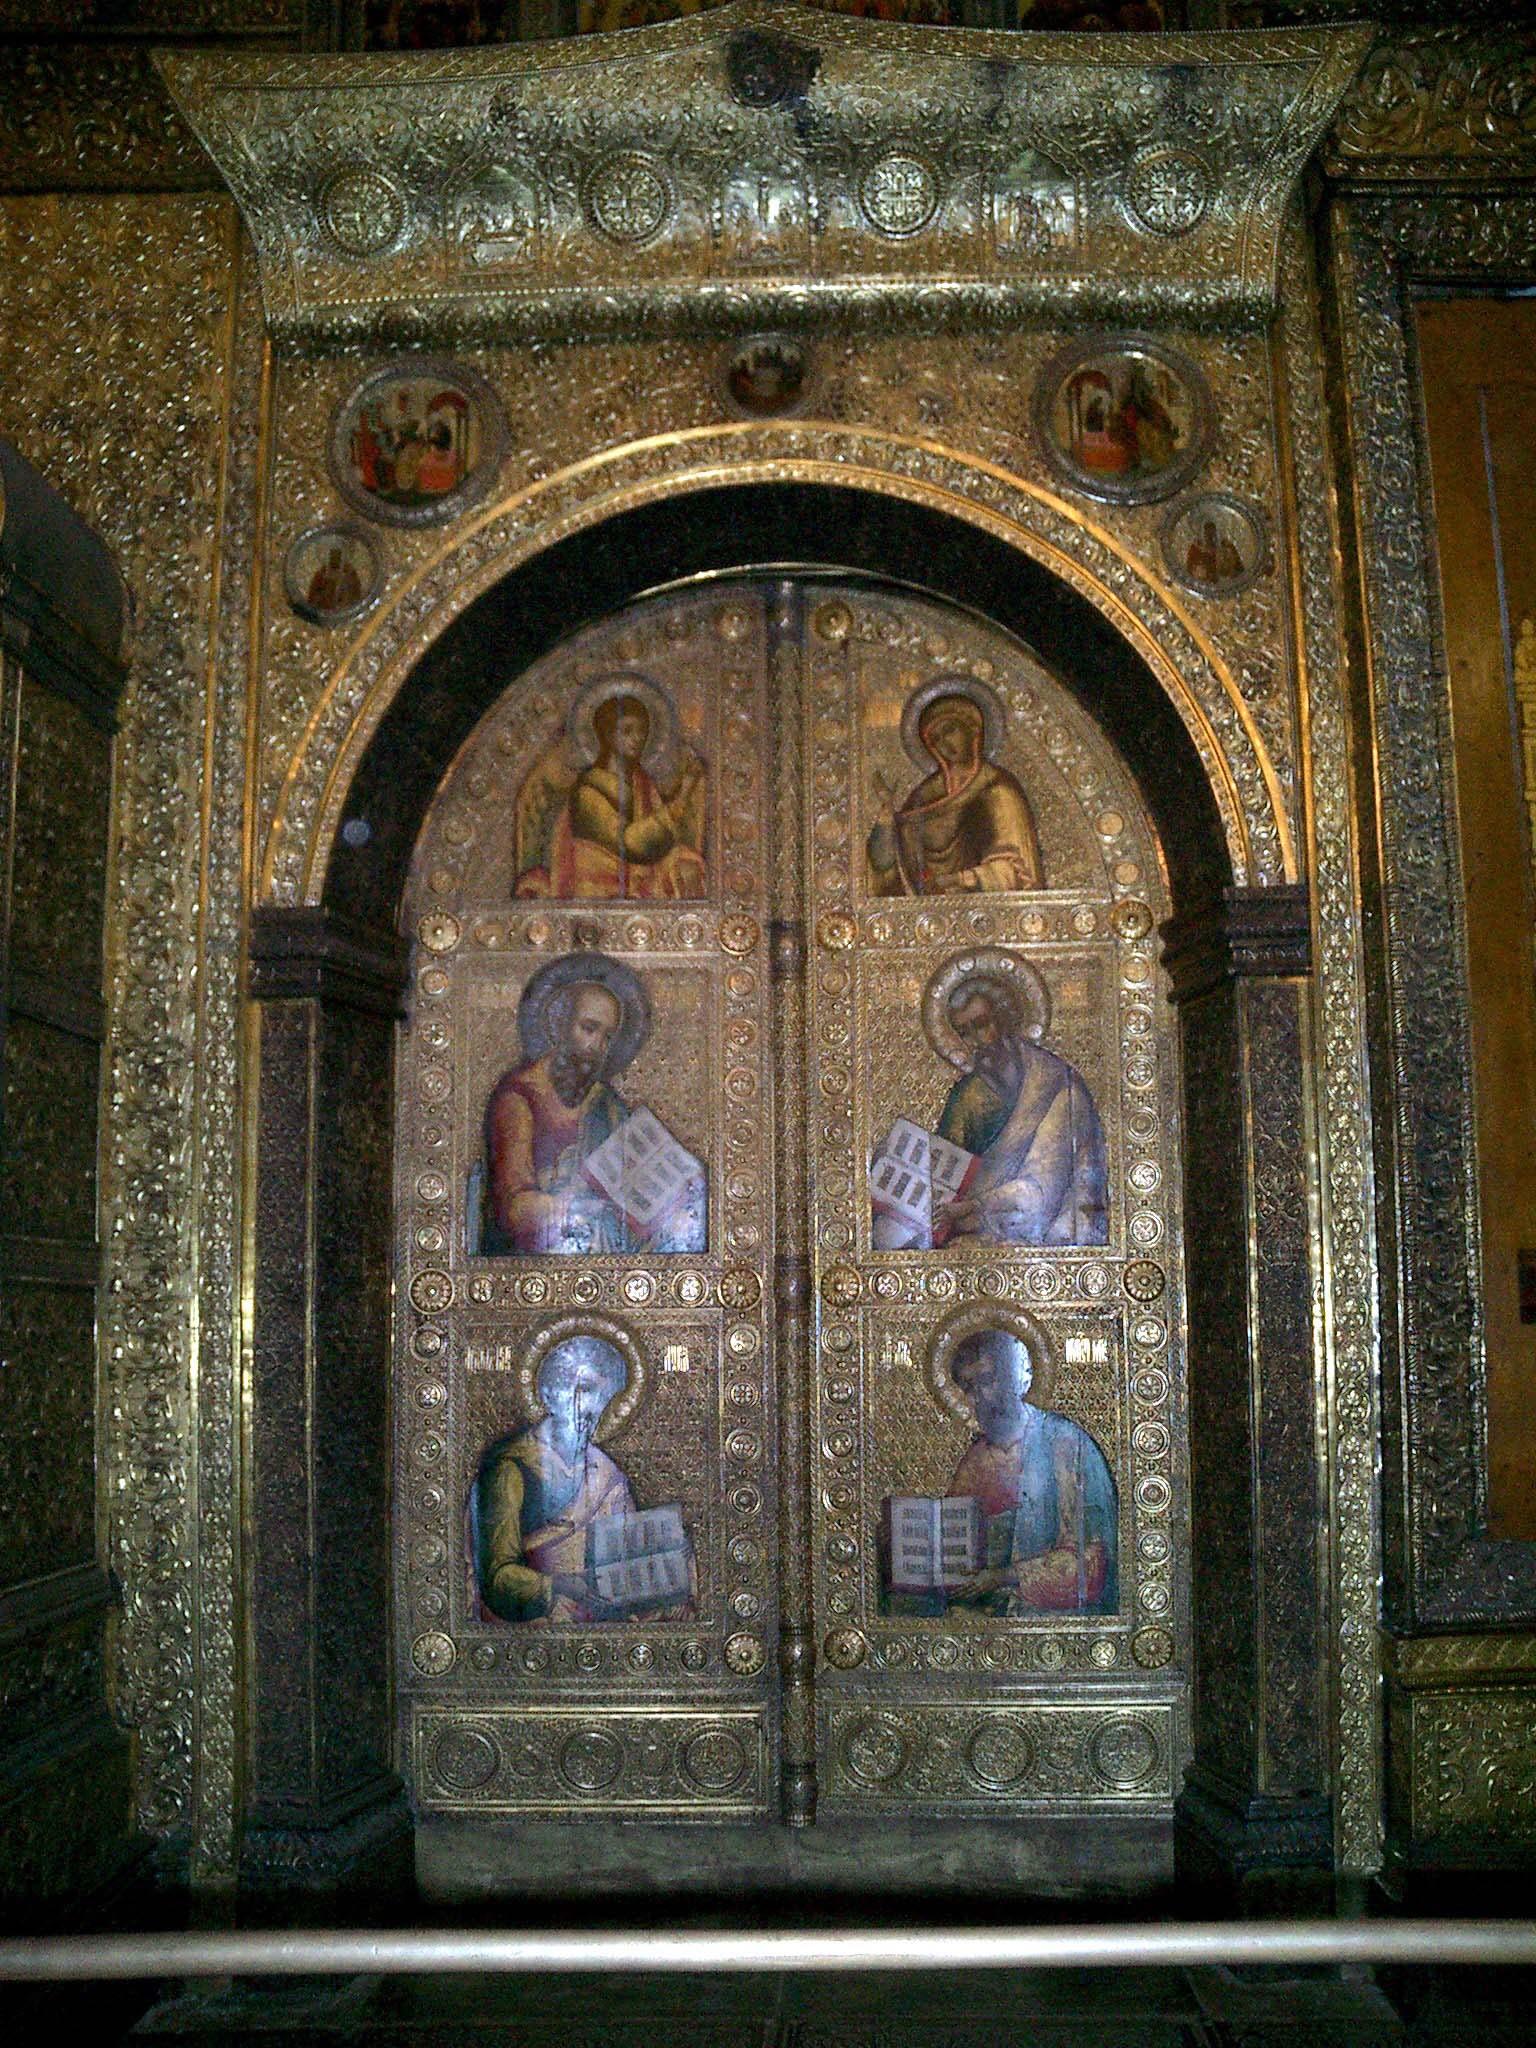 Moscow Kremlin Patriarchs Palace Church of 12 Apostles 2005 15